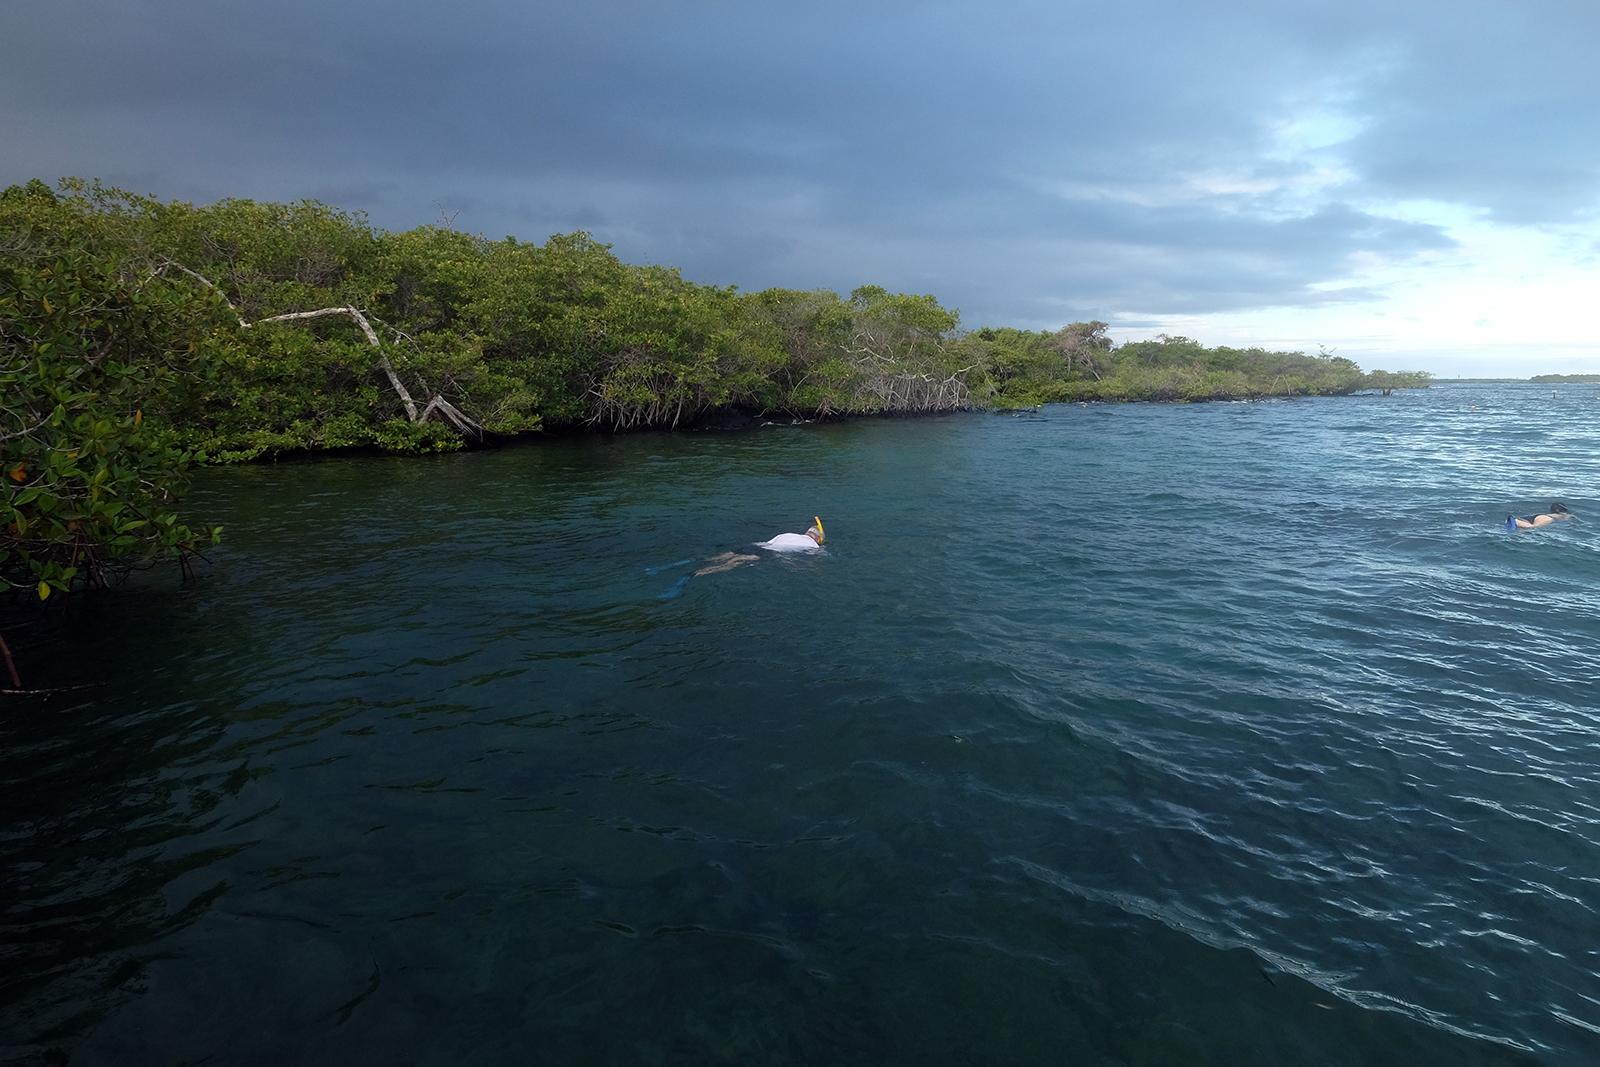 02_Playa_Concha_de_Perla_02_manglares.JPG